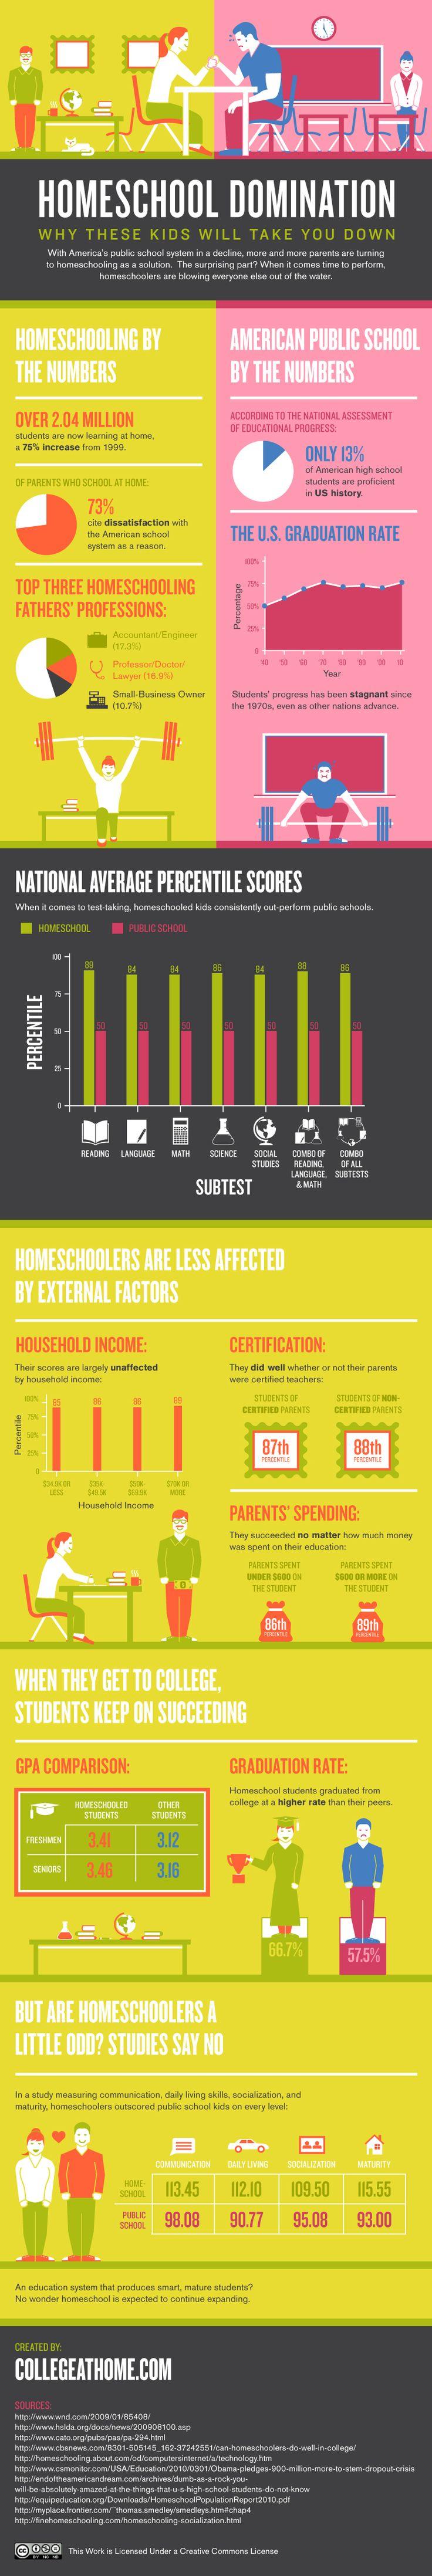 Homeschooling vs public education.